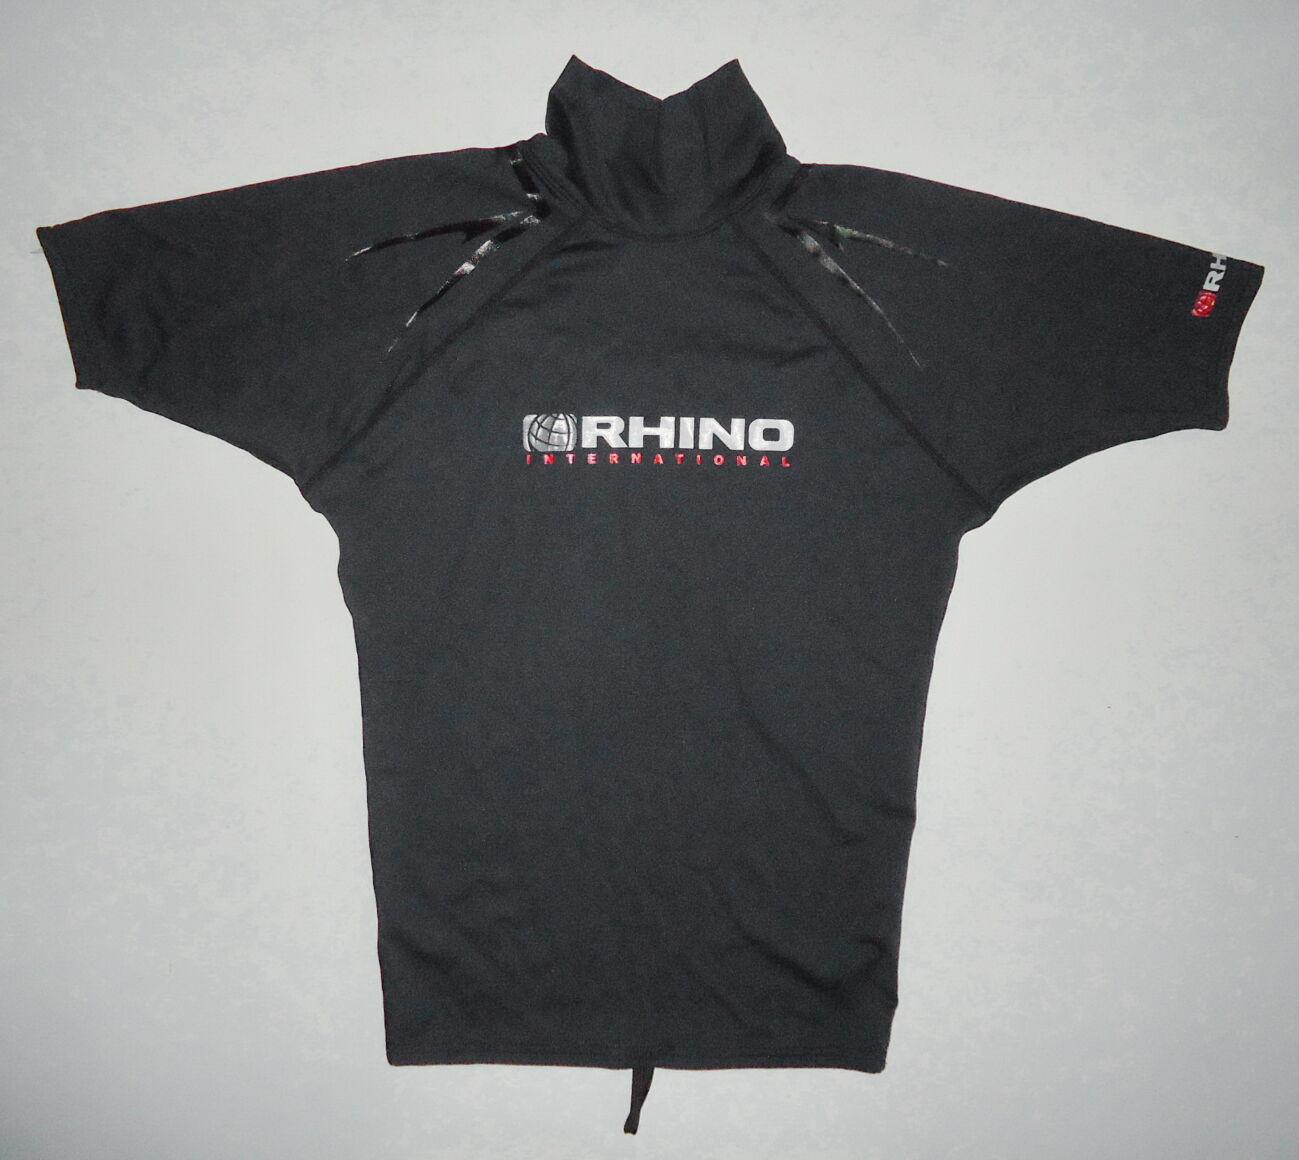 Гидрофутболка RHINO серфинг рафтинг черная дайвинг M